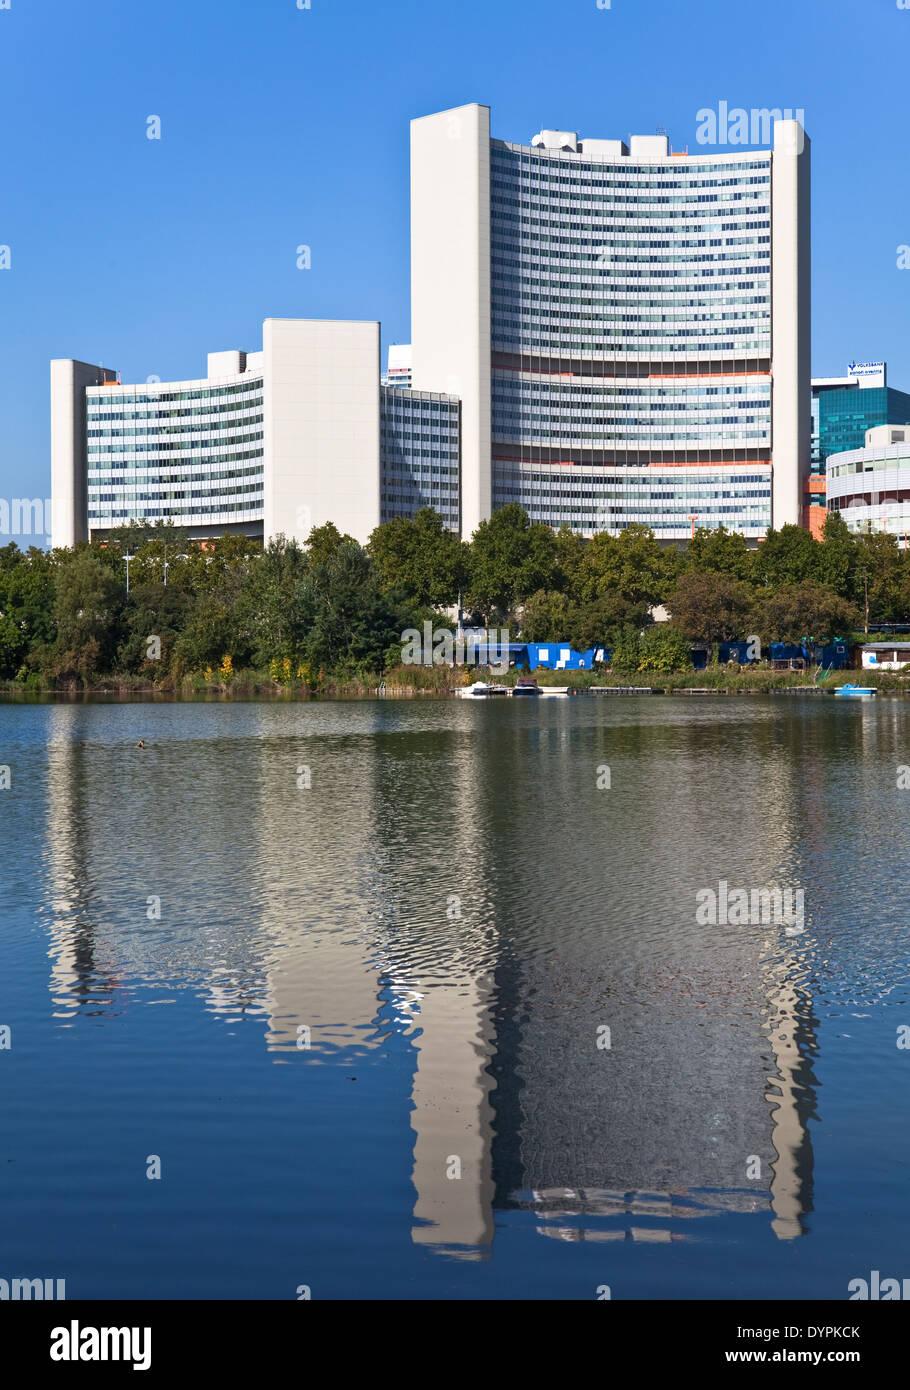 UNO City, Vienna, Austria - Stock Image